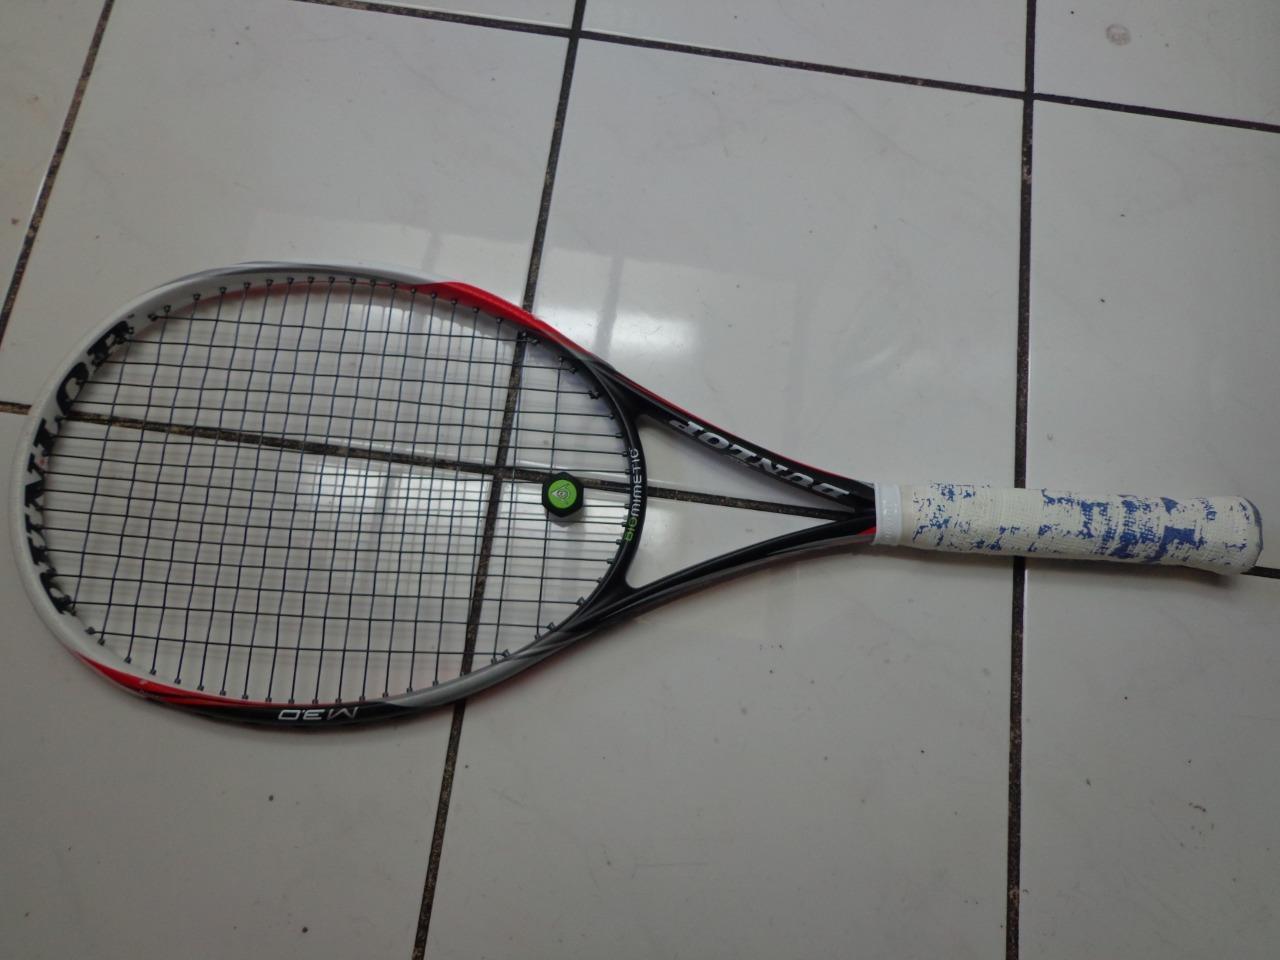 Dunlop Biomimetic m 3.0 98 head 4 1 2 grip Tennis Racquet